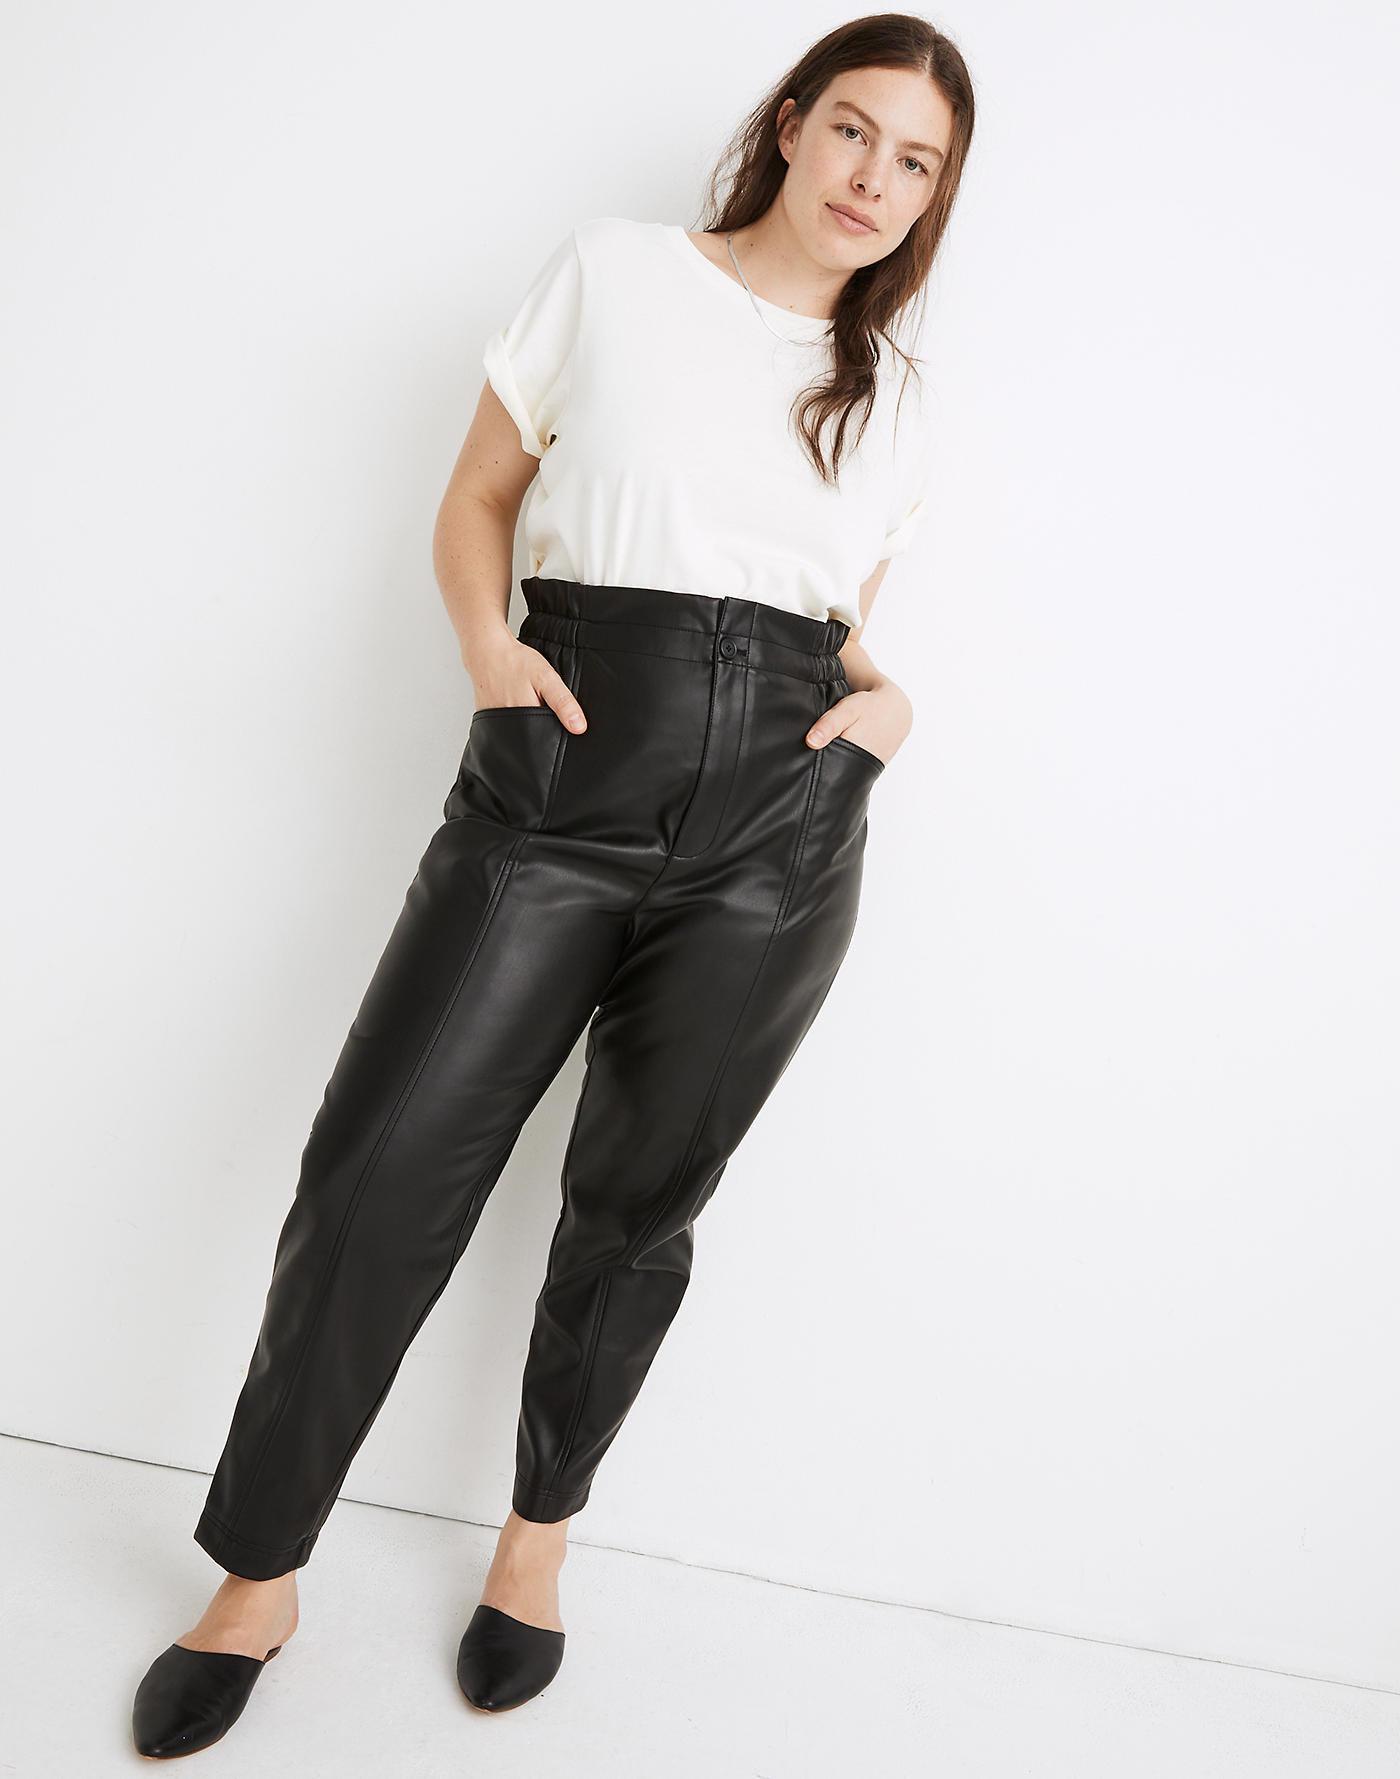 Model wearing black faux leather pants